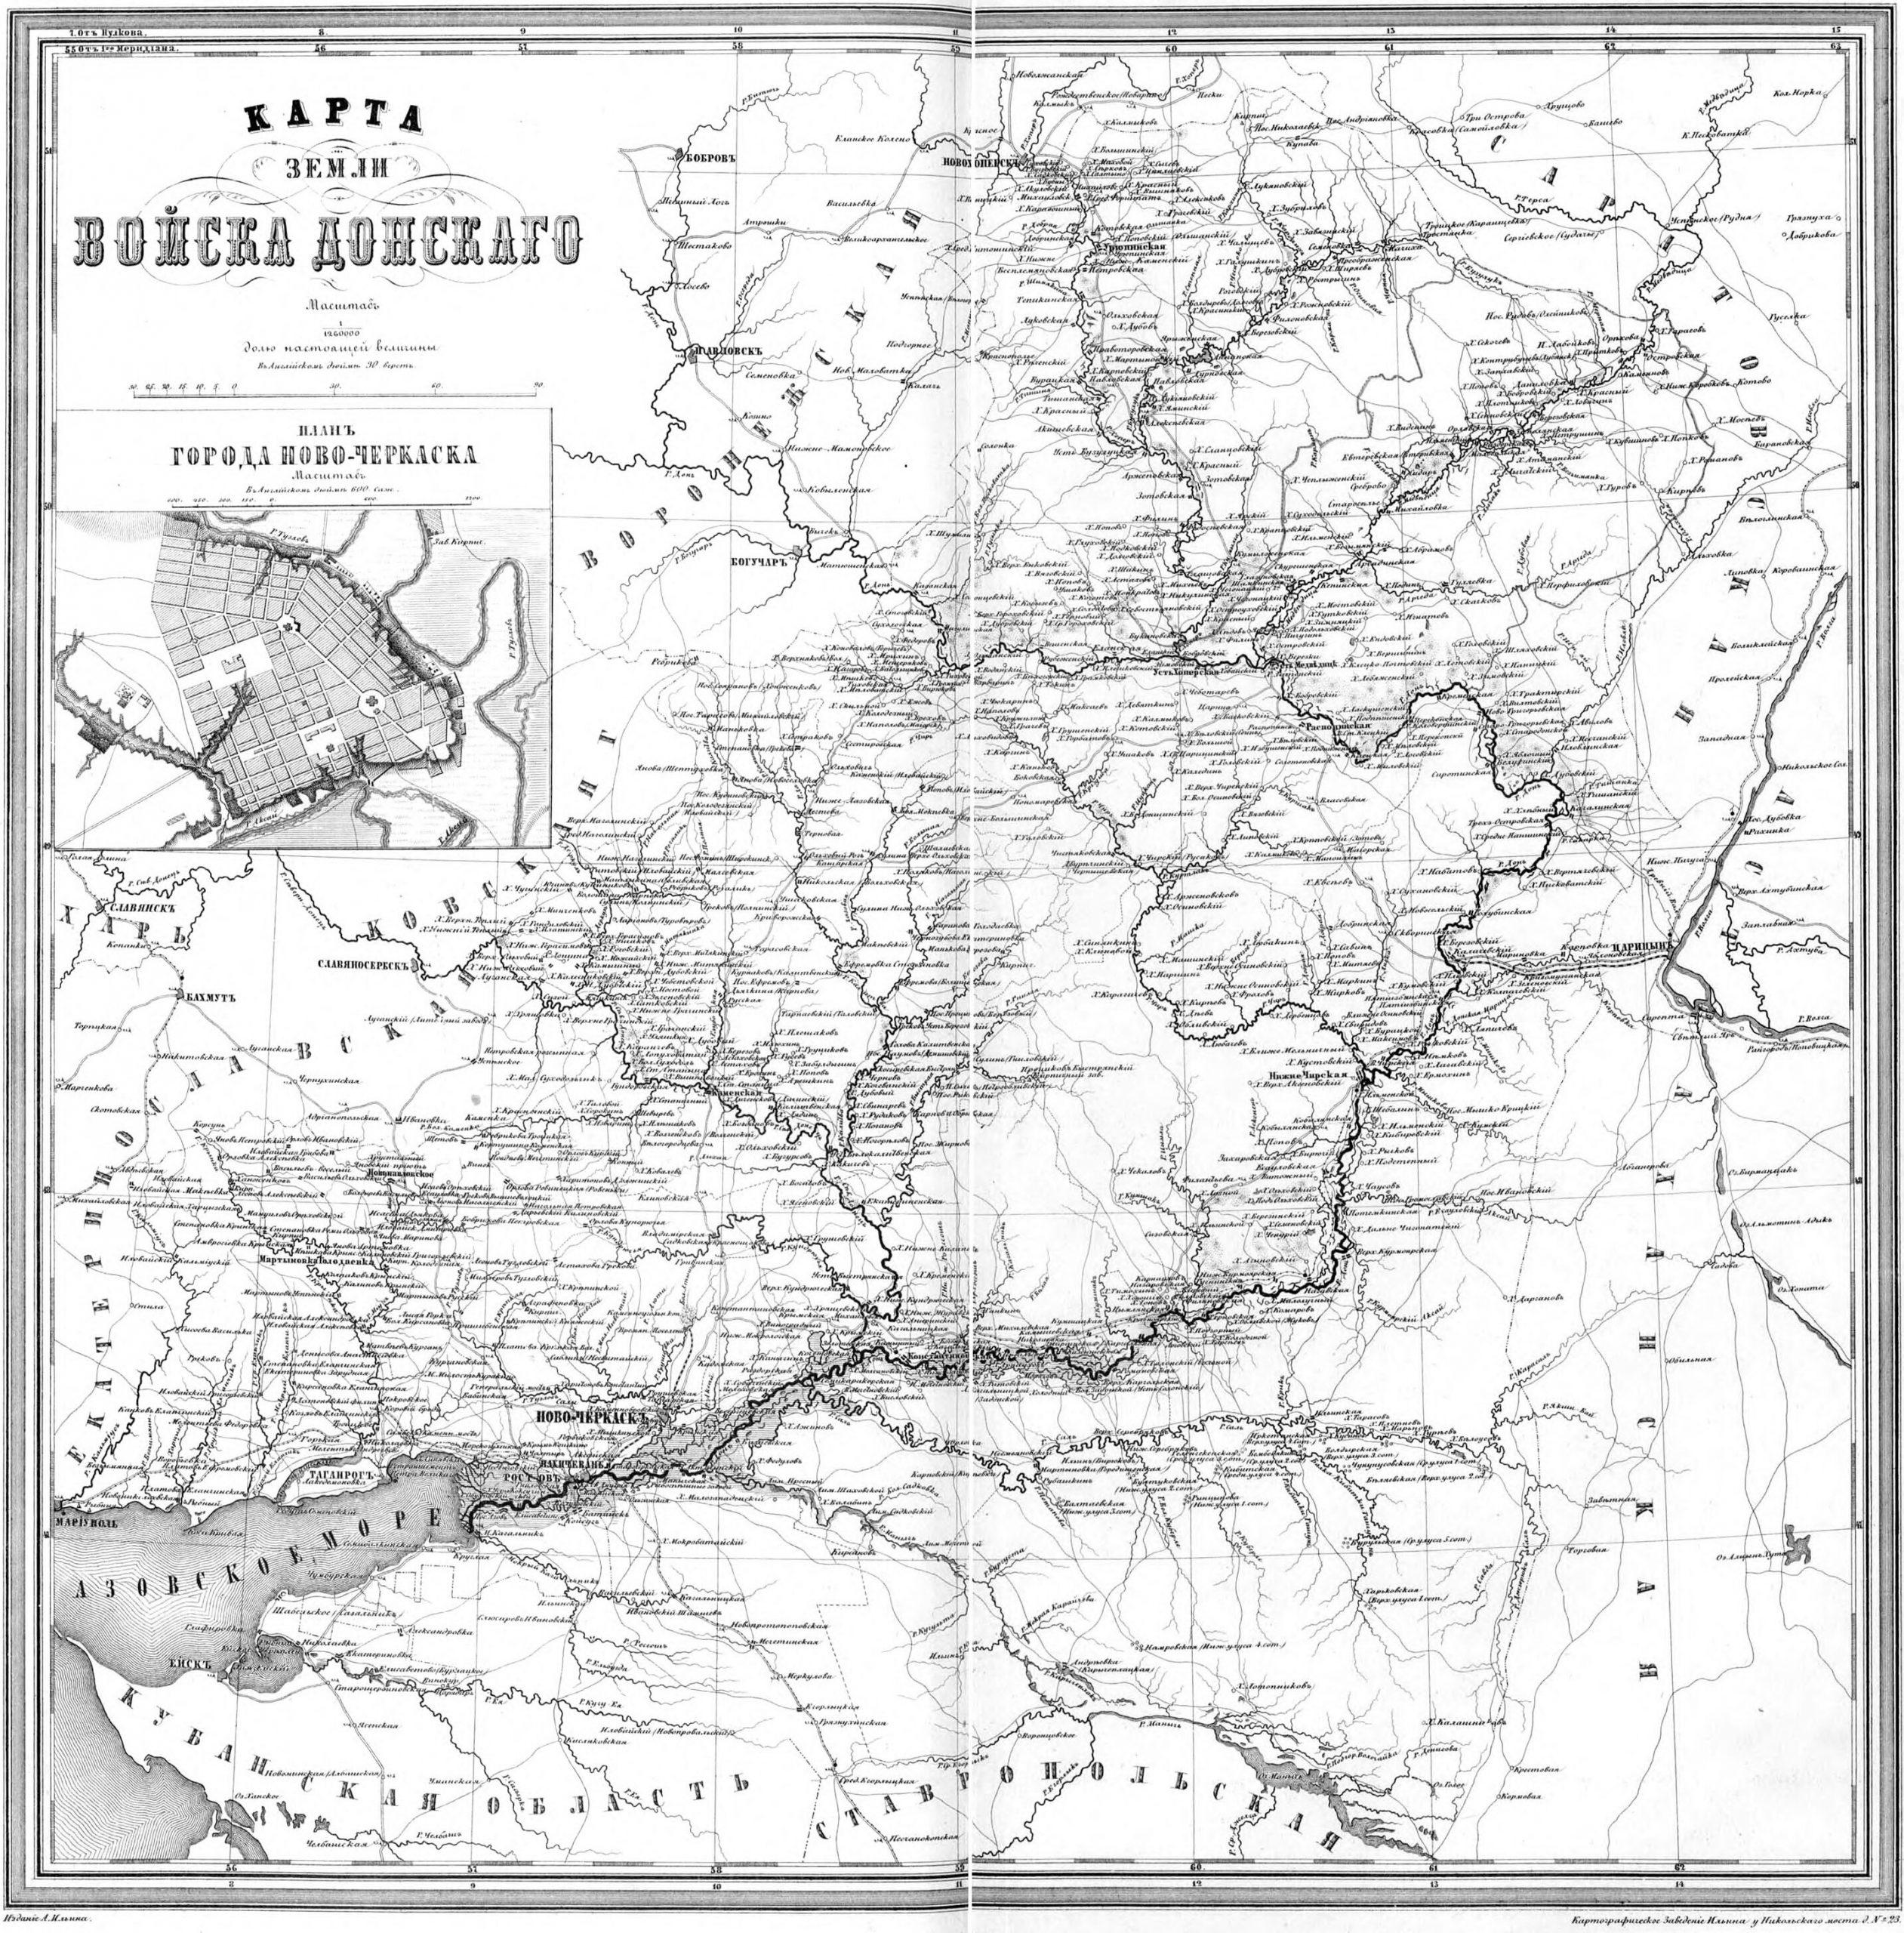 Карта земли ВОЙСКА ДОНСКАГО